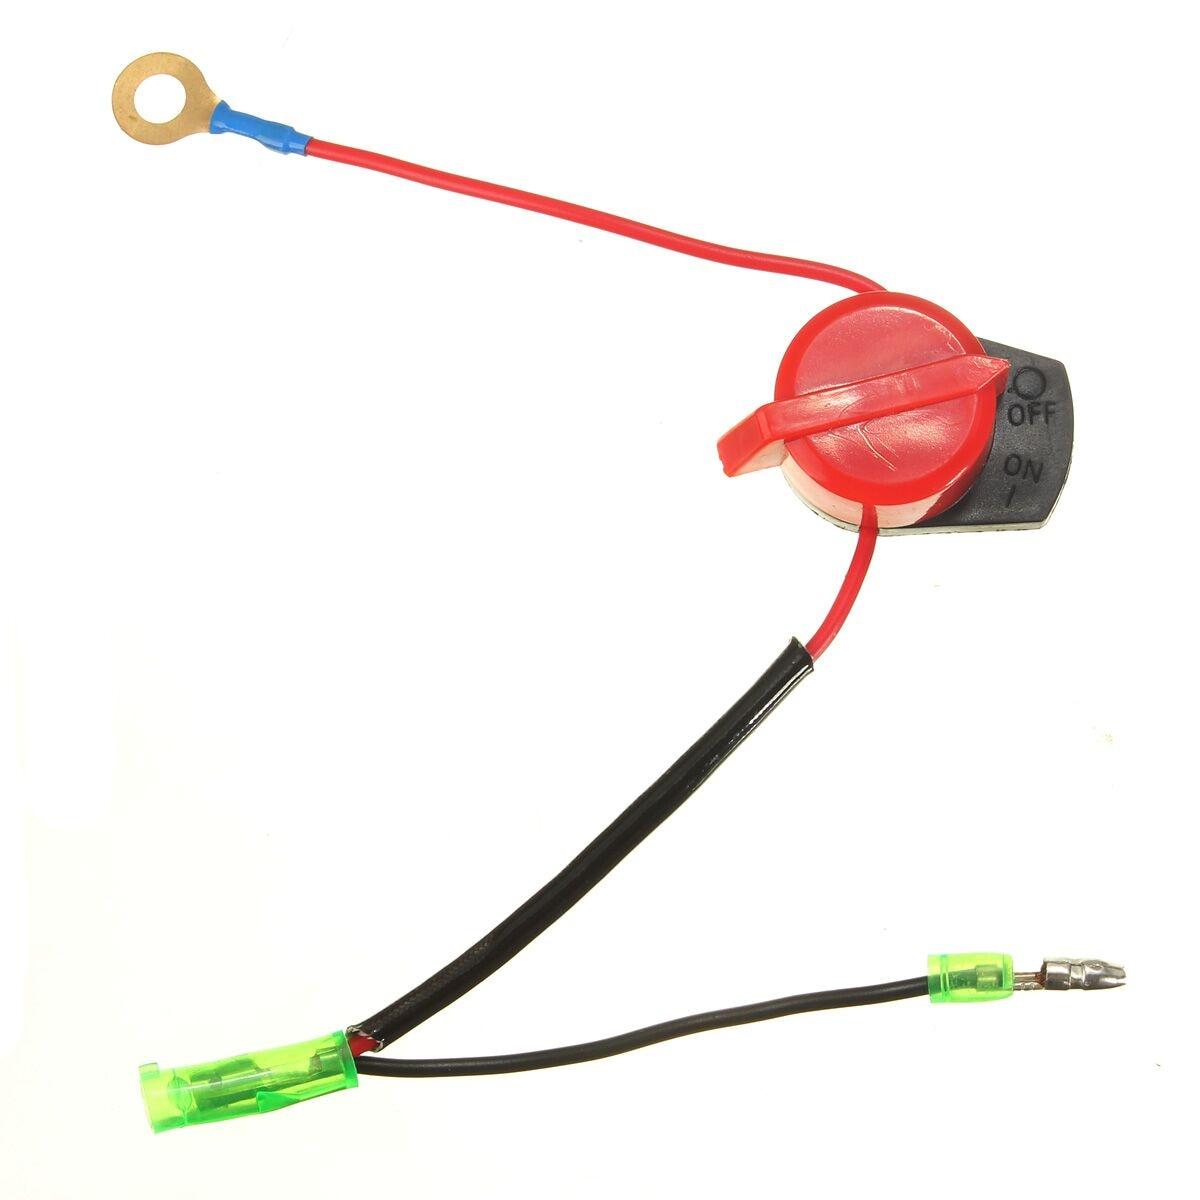 Interruptor de encendido y apagado de doble Cable para HONDA/GX120/GX160/GX200/GX240/GX270/GX340/GX390